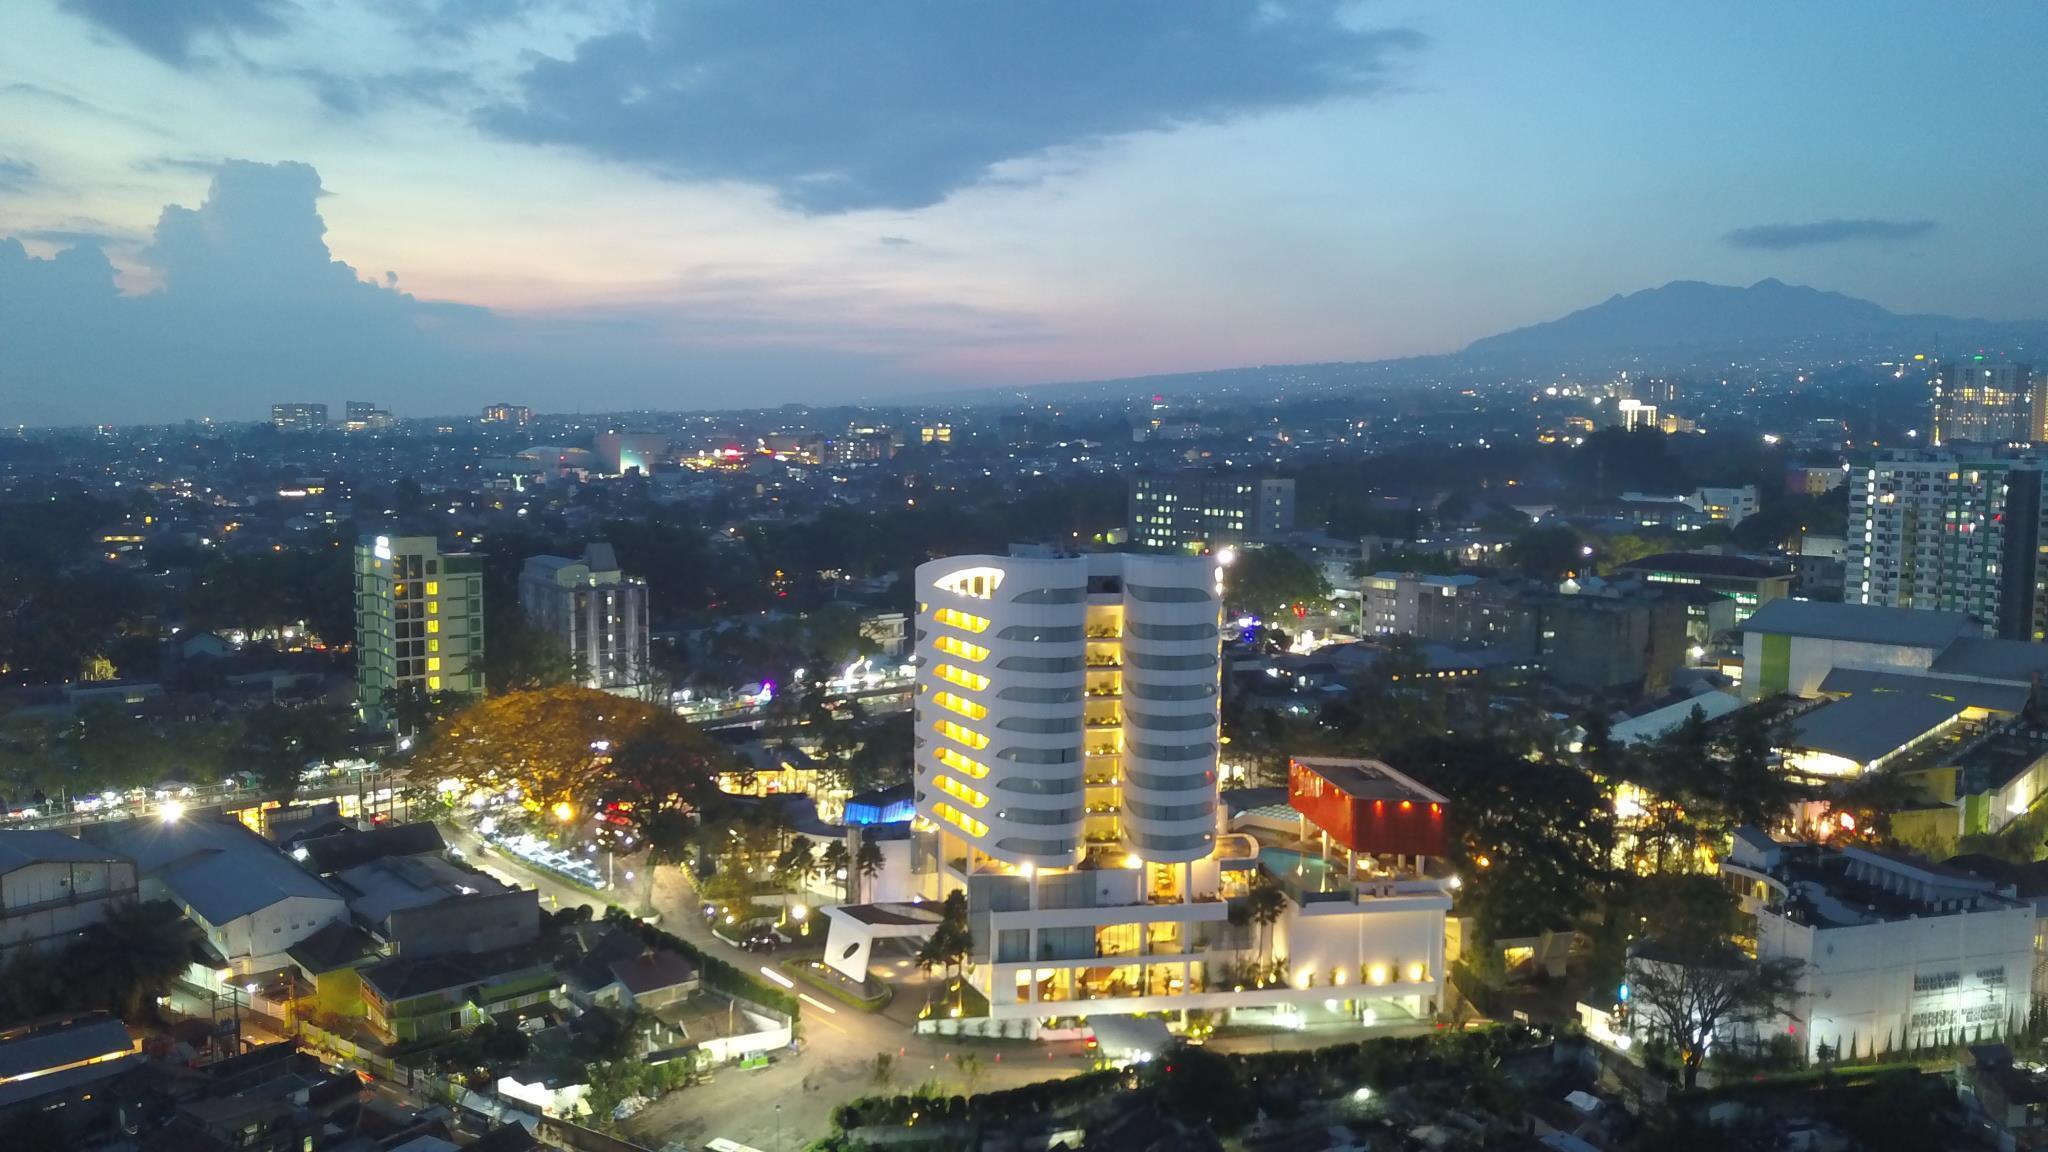 sensa hotel bandung indonesia from 49 save on agoda rh agoda com